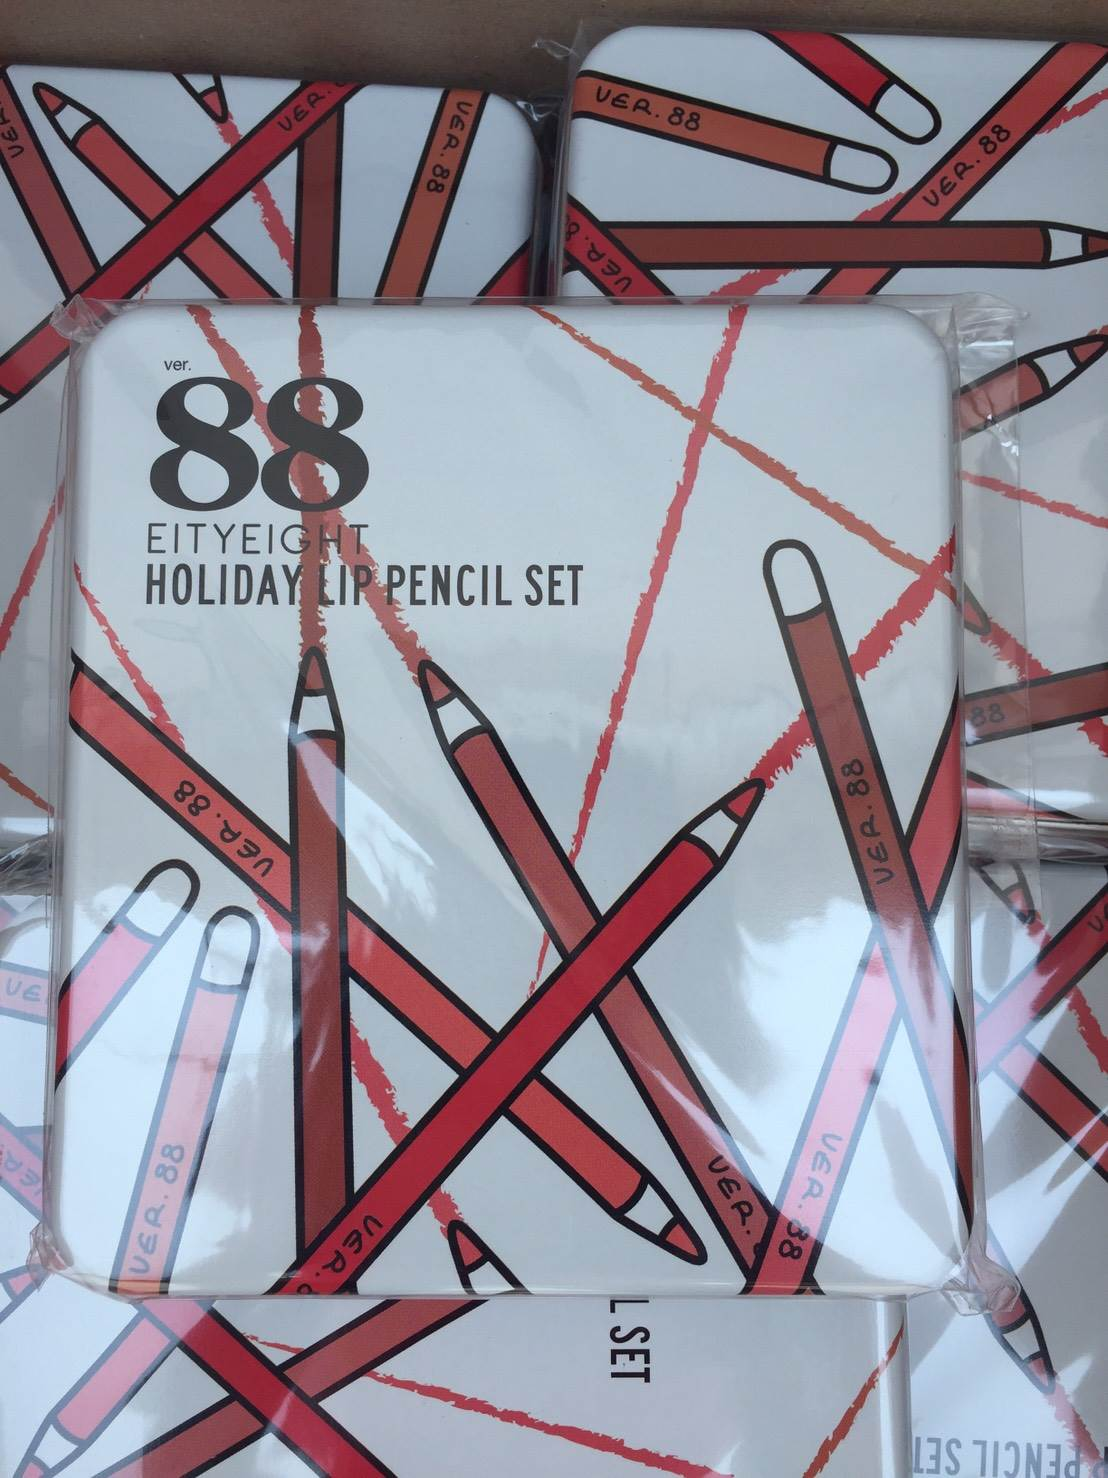 Ver88 Holiday Lip Pencil Set Happy Angel Shop Eighty Eight